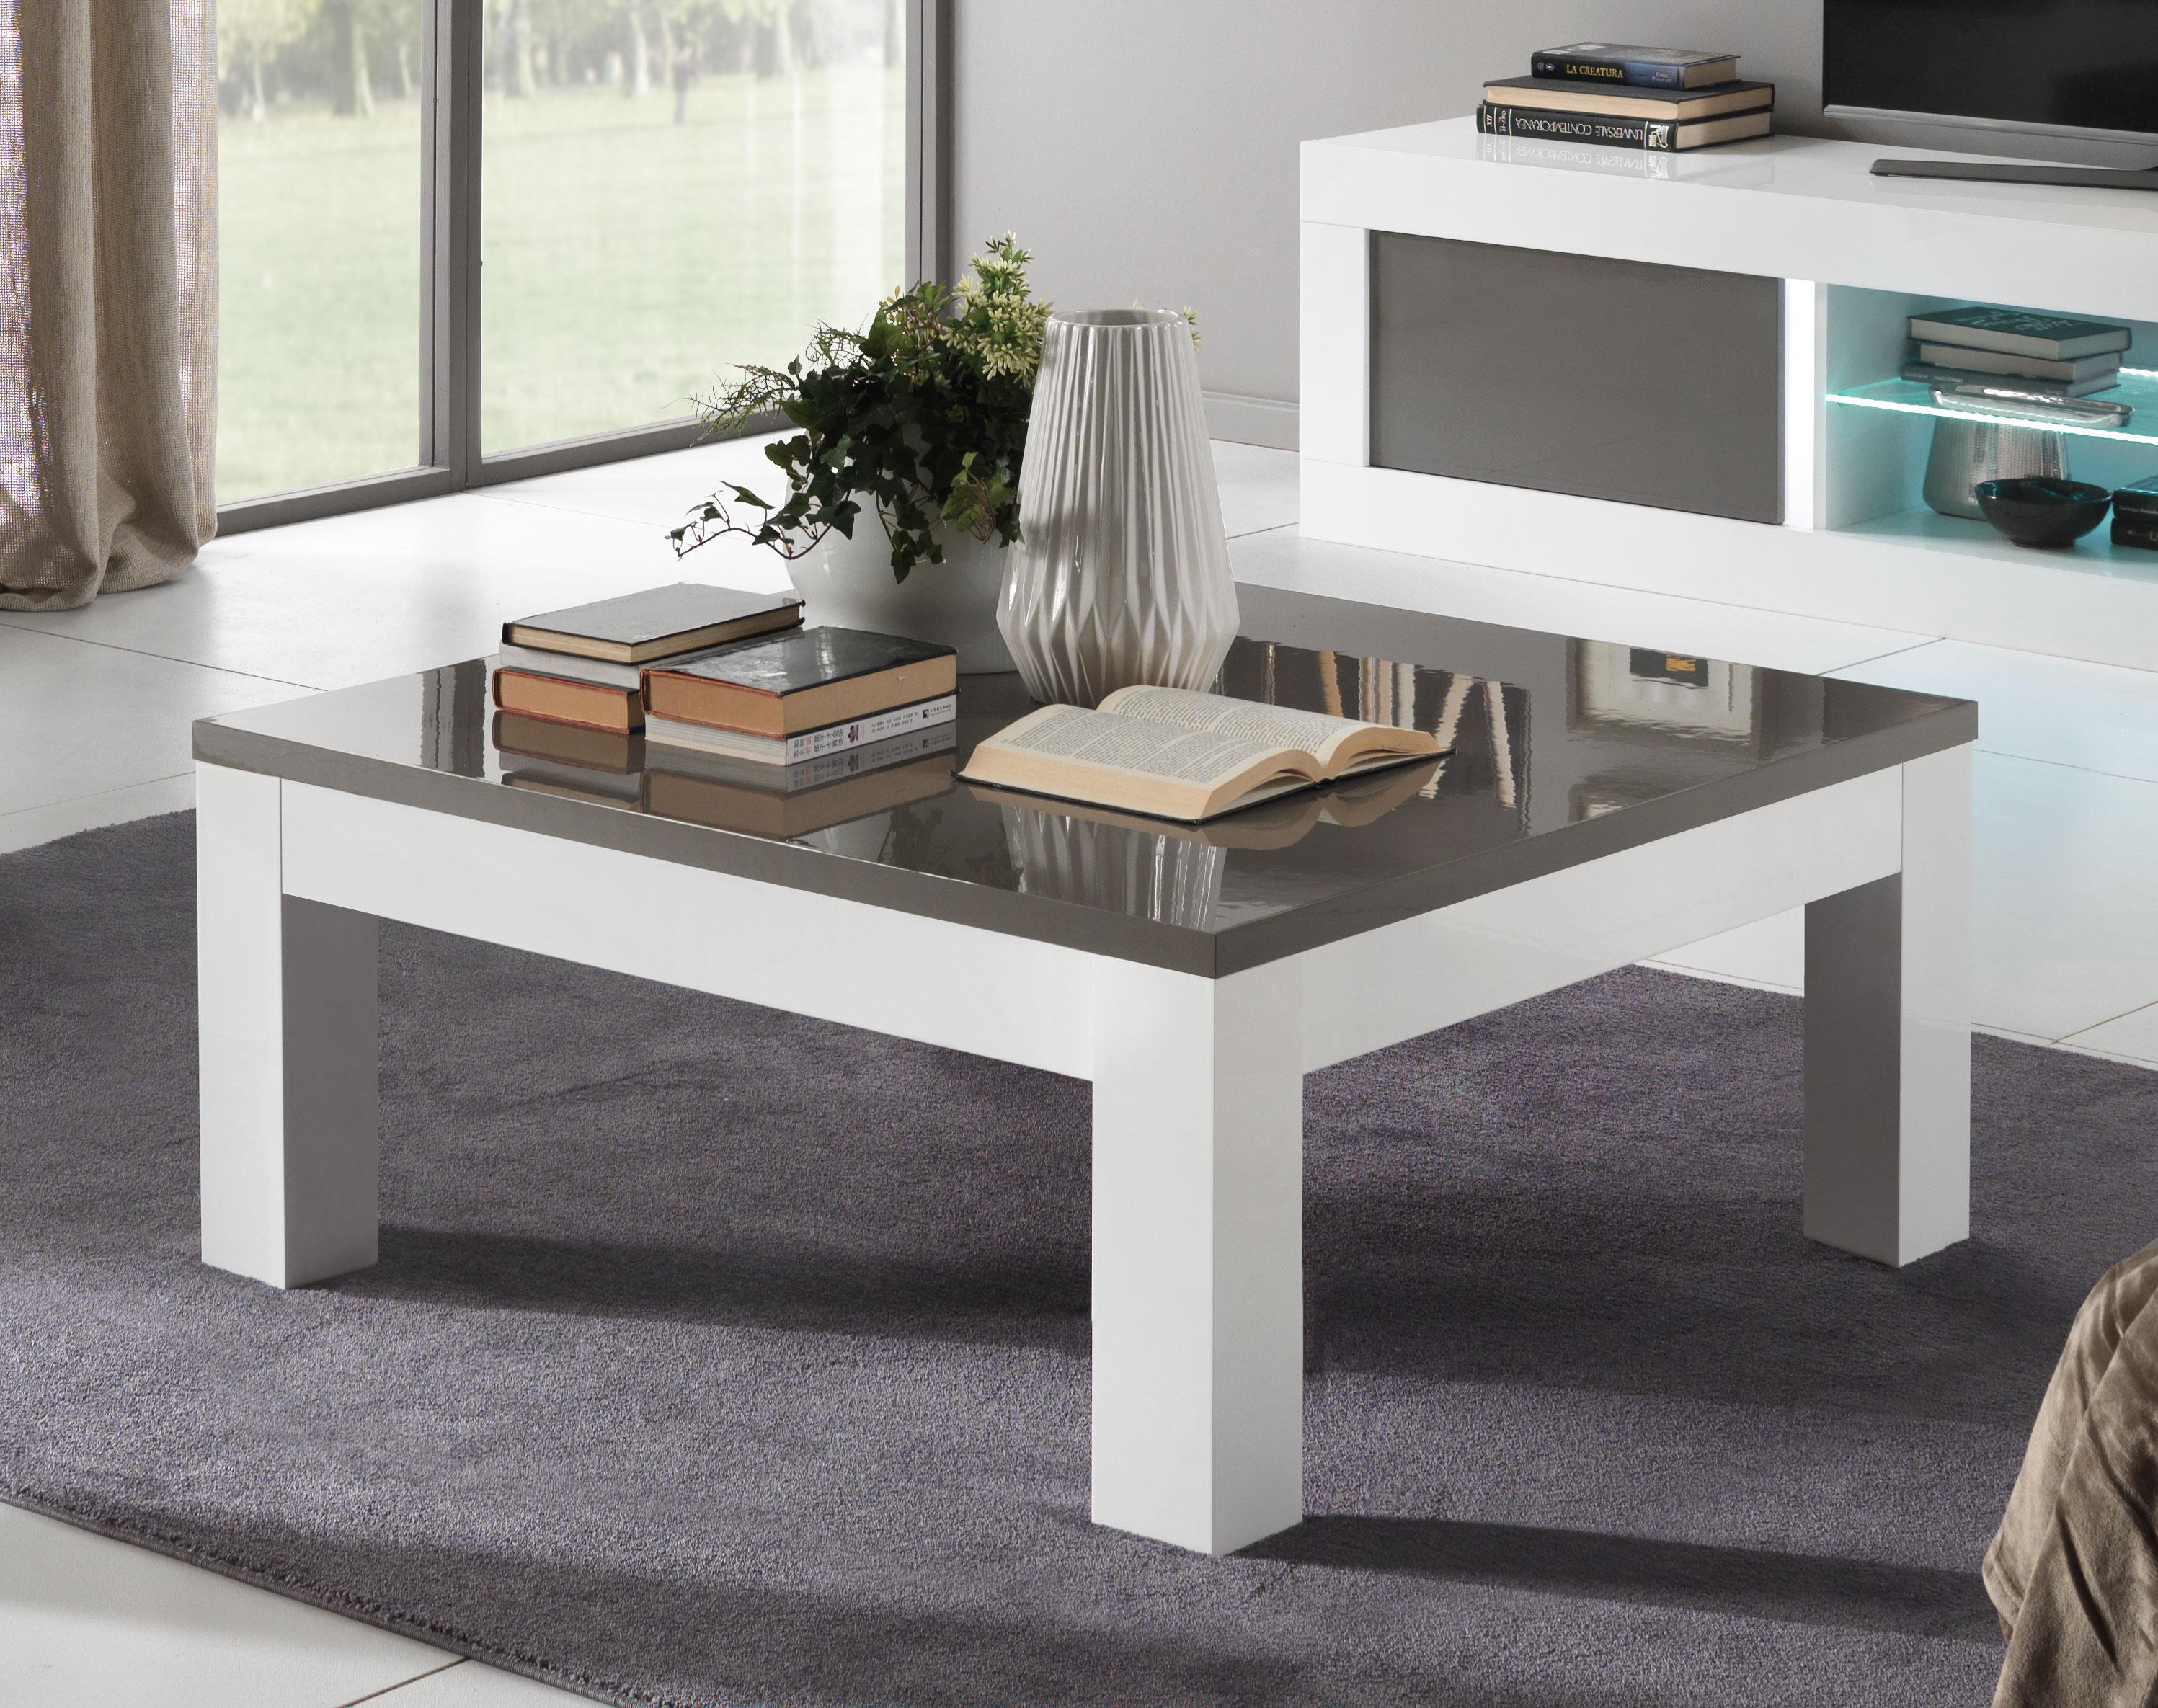 Table Basse Design Carree Laquee Blanche Et Grise Romain Matelpro